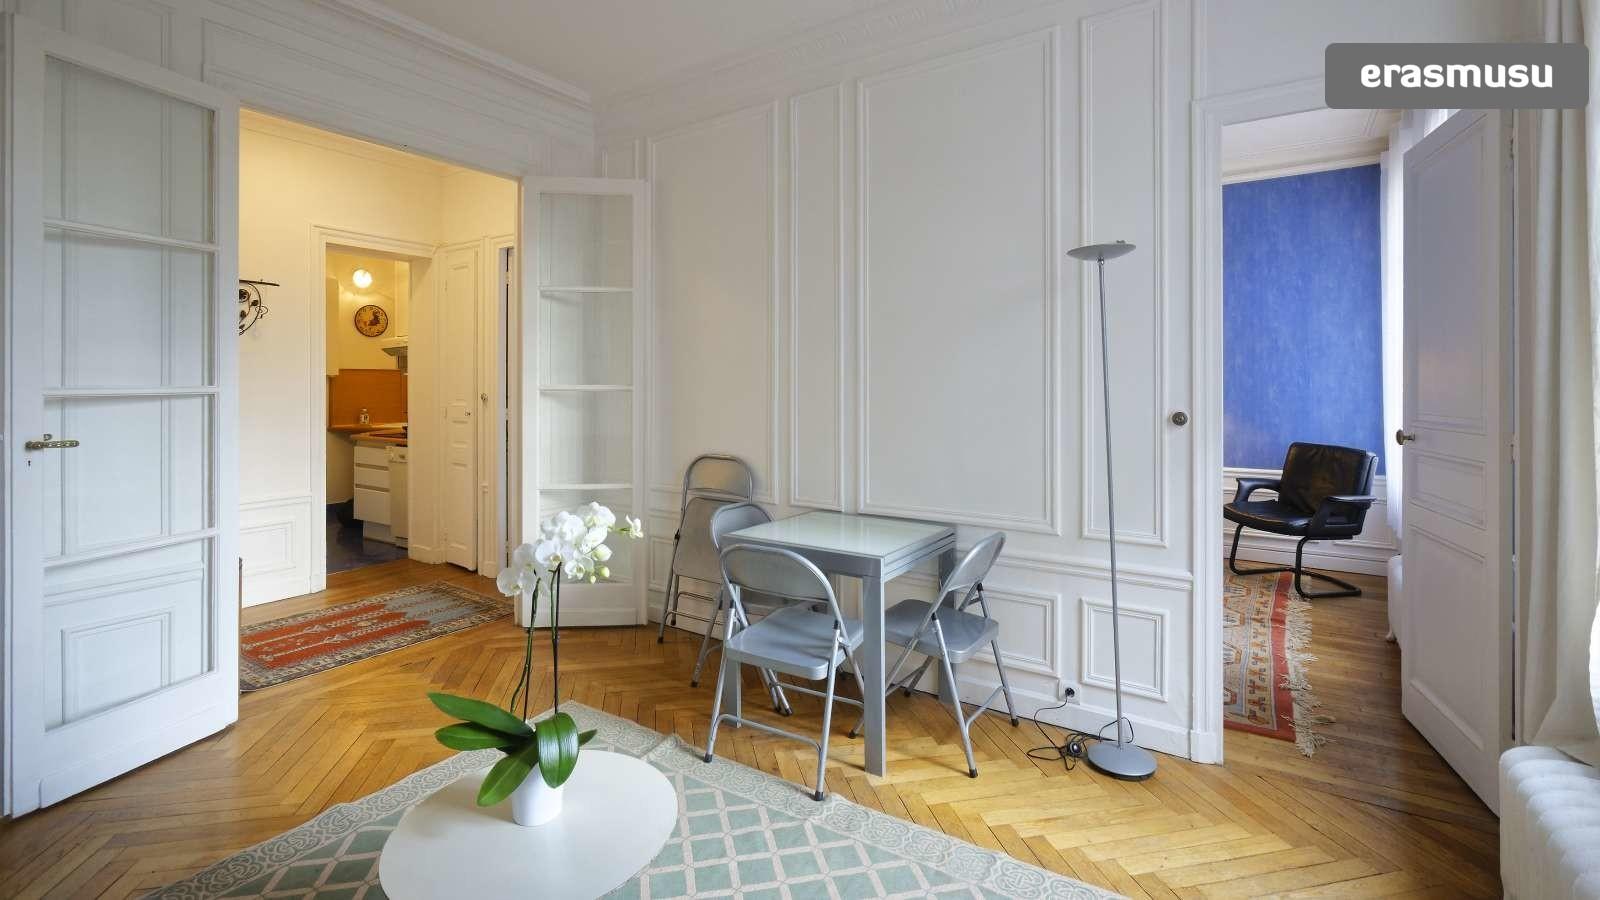 Elegant 1 Bedroom Apartment For Rent In Passy With Utilities Included Flat Rent Paris